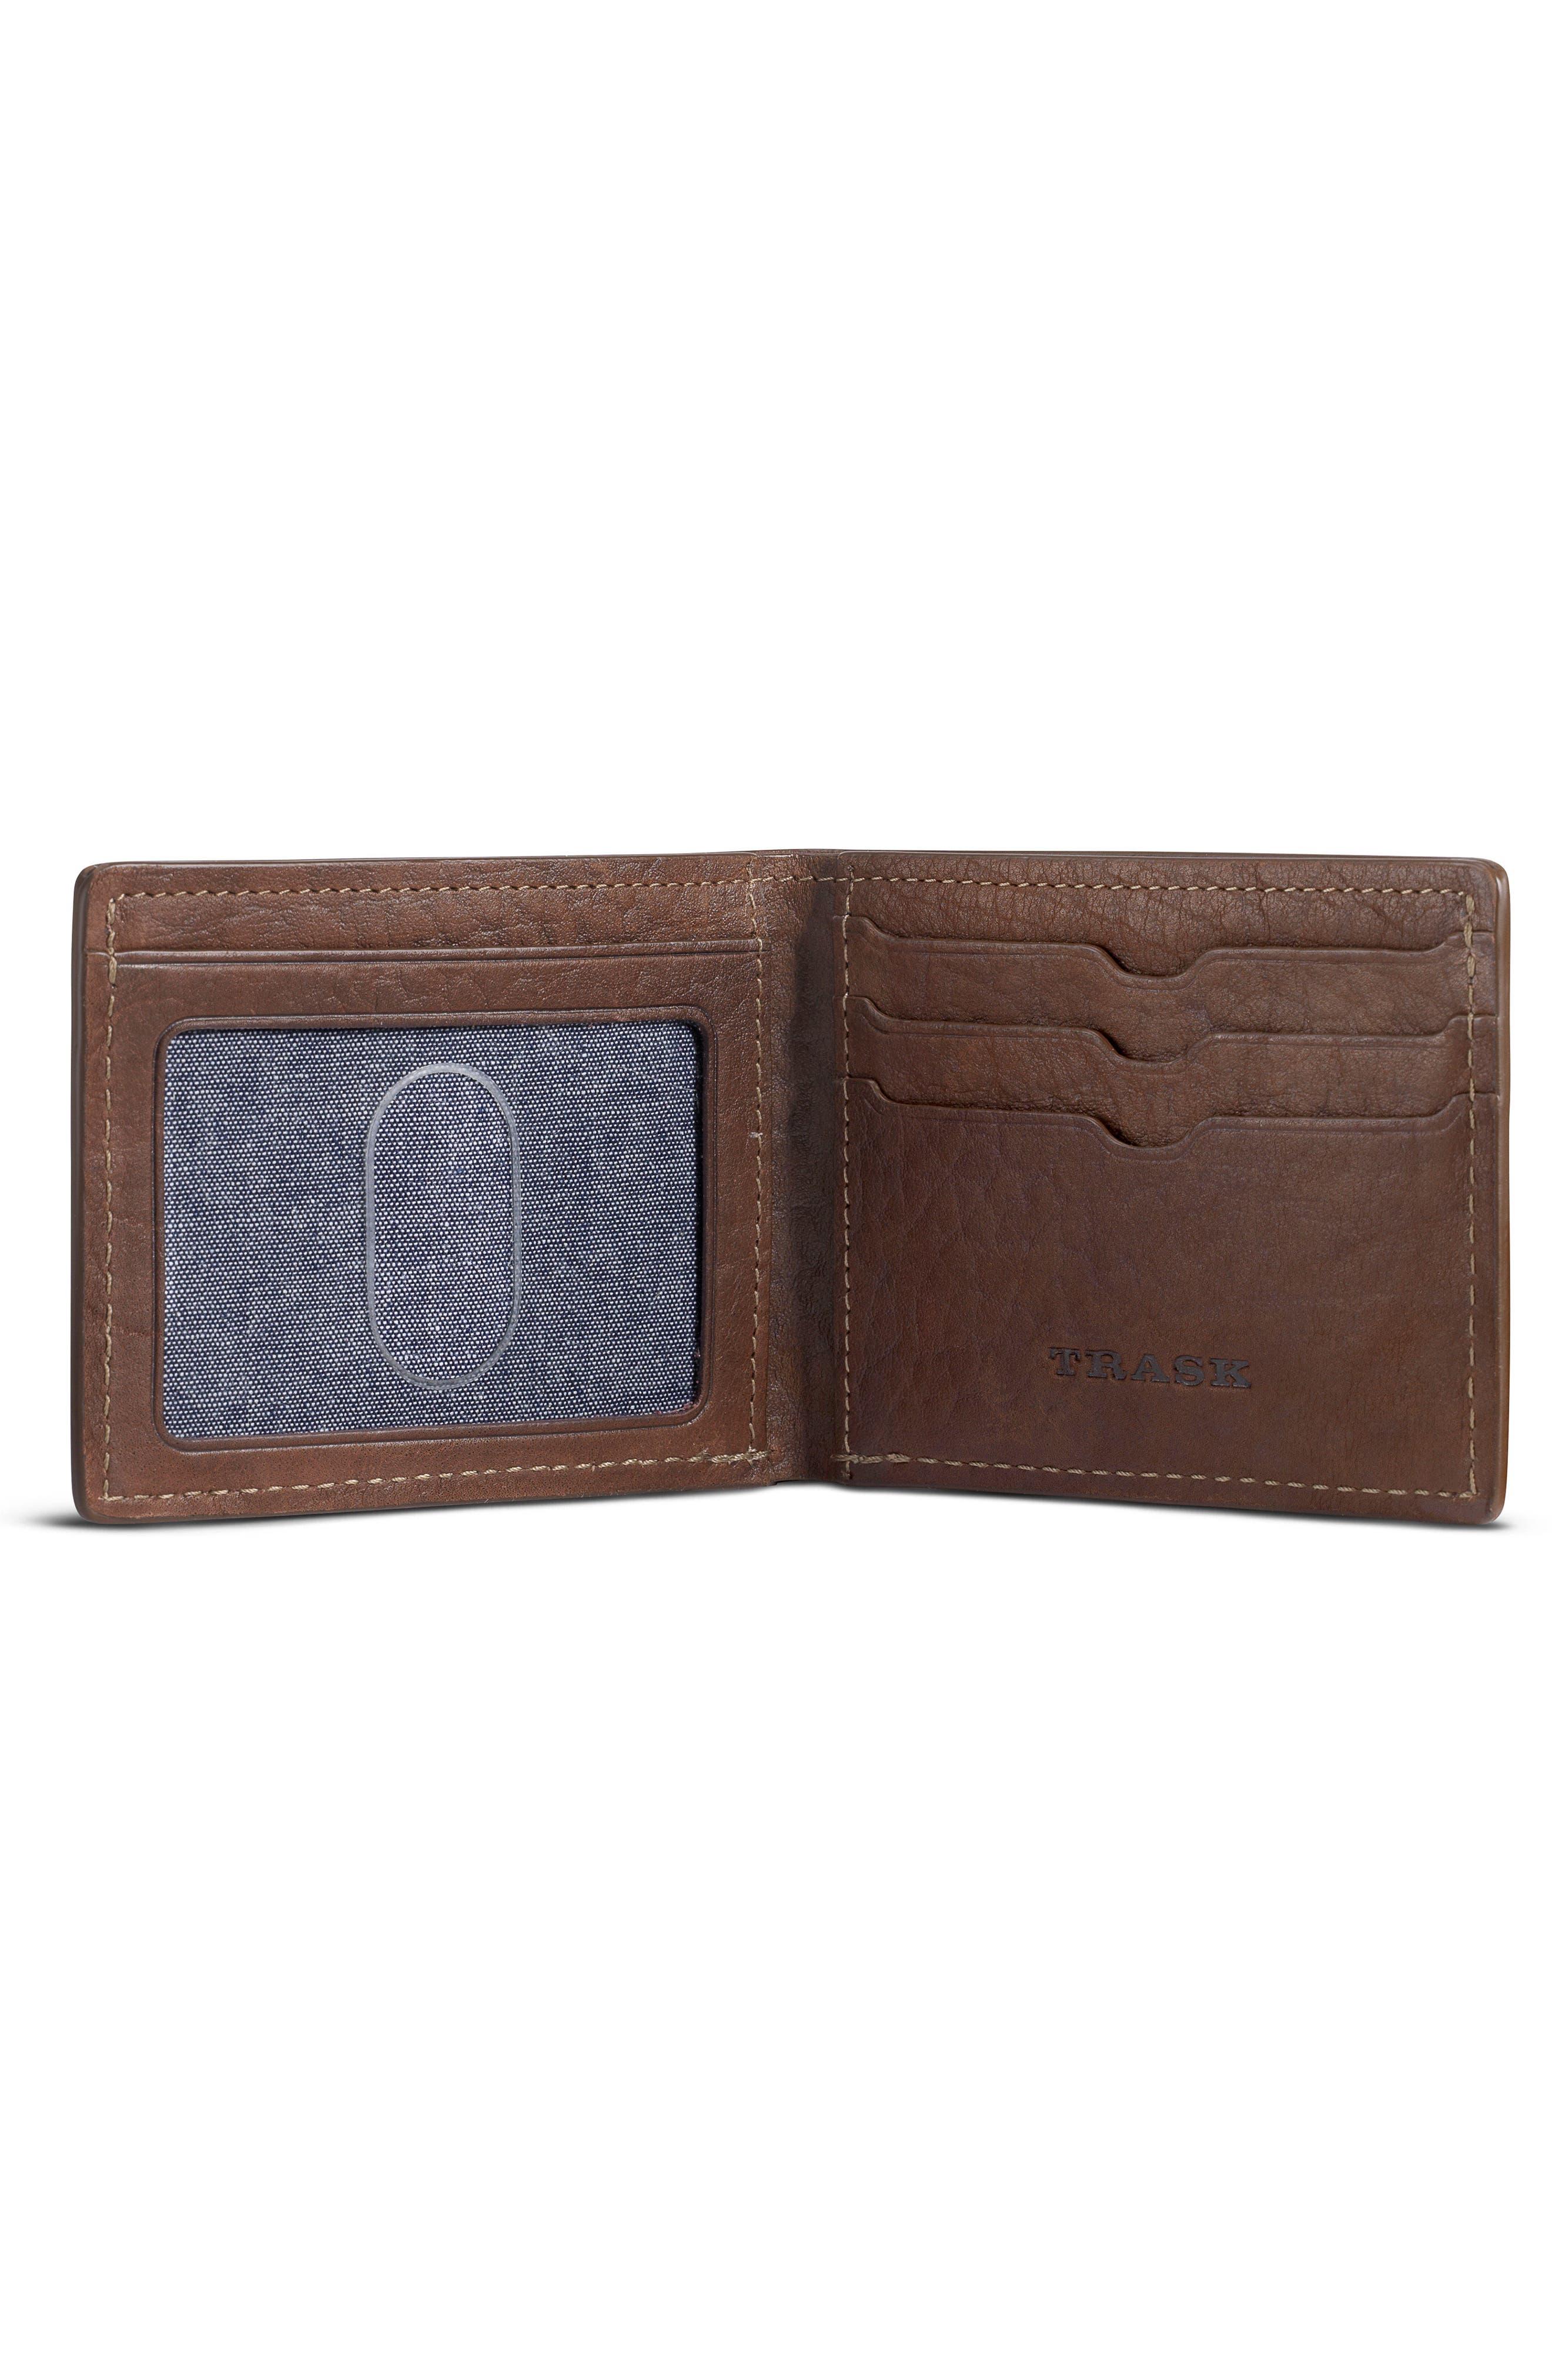 Jackson Super Slim Wallet,                             Alternate thumbnail 2, color,                             200